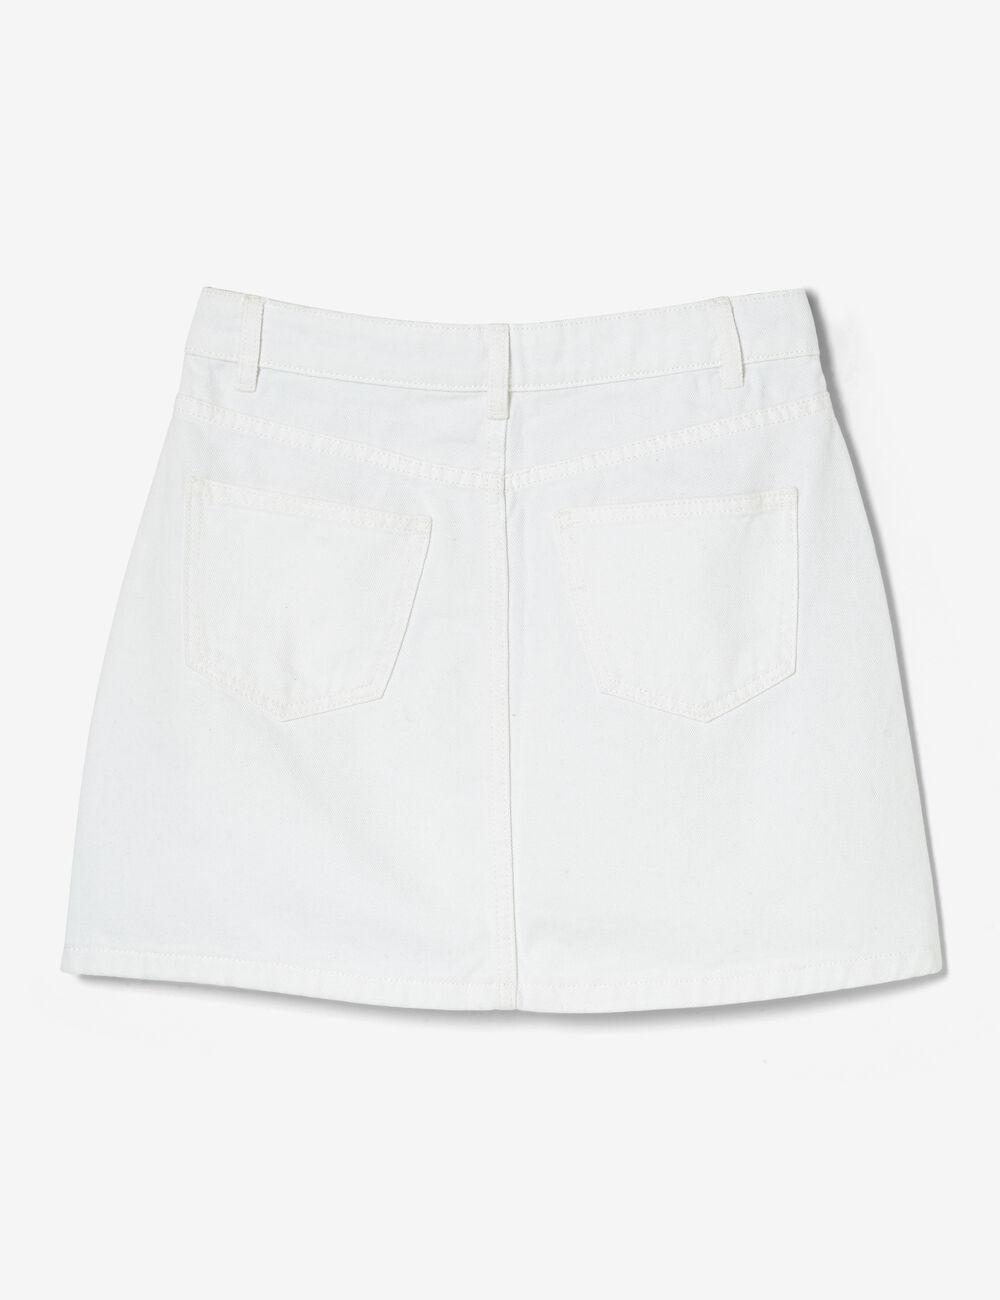 41247ee90da101 Jupe en jean boutonnée blanche femme • Jennyfer